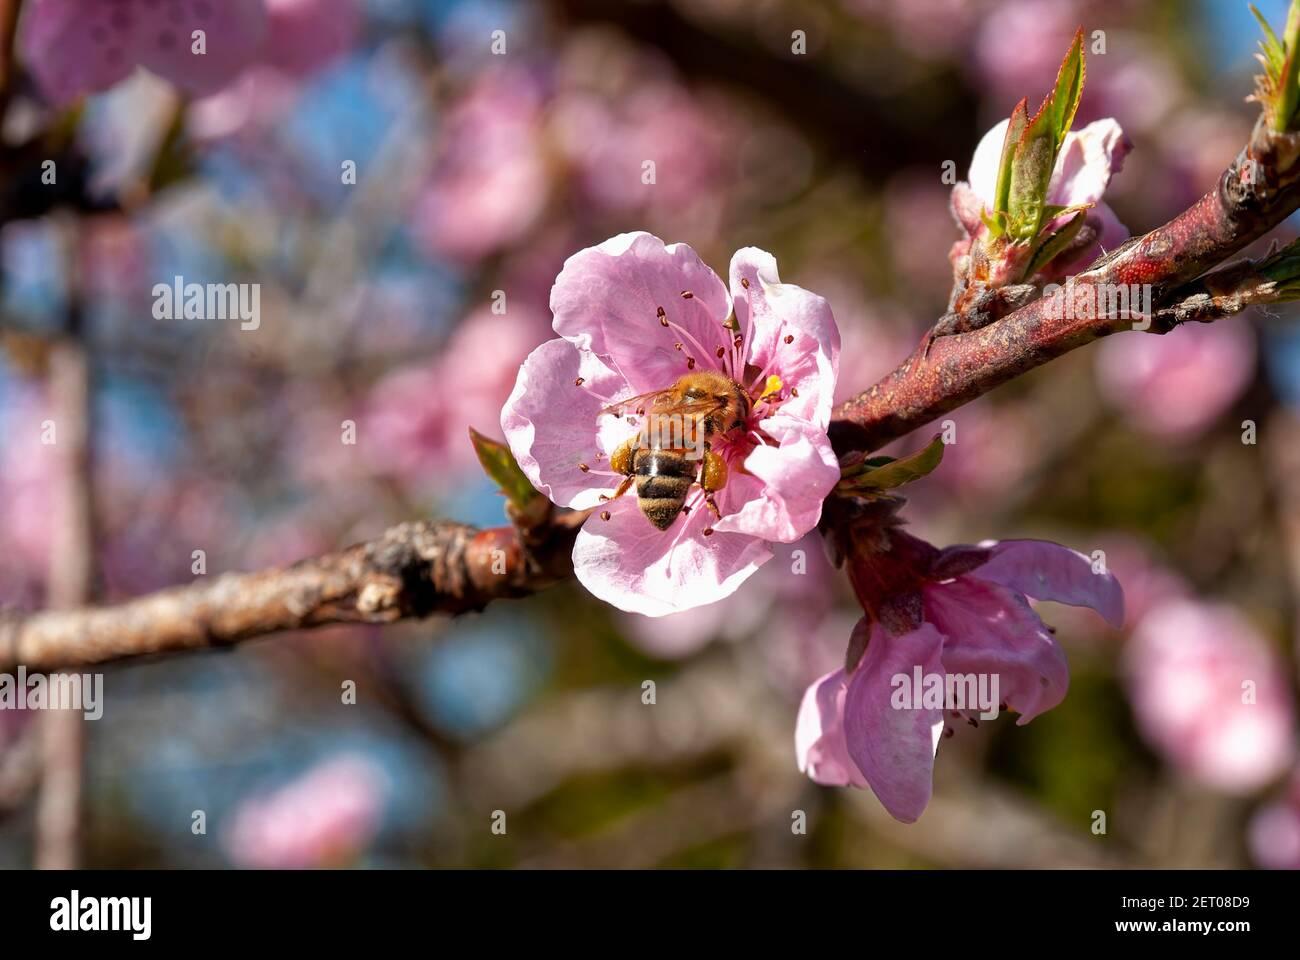 Working Carniolan honey bee (Apis mellifera carnica), peach blossom. Stock Photo